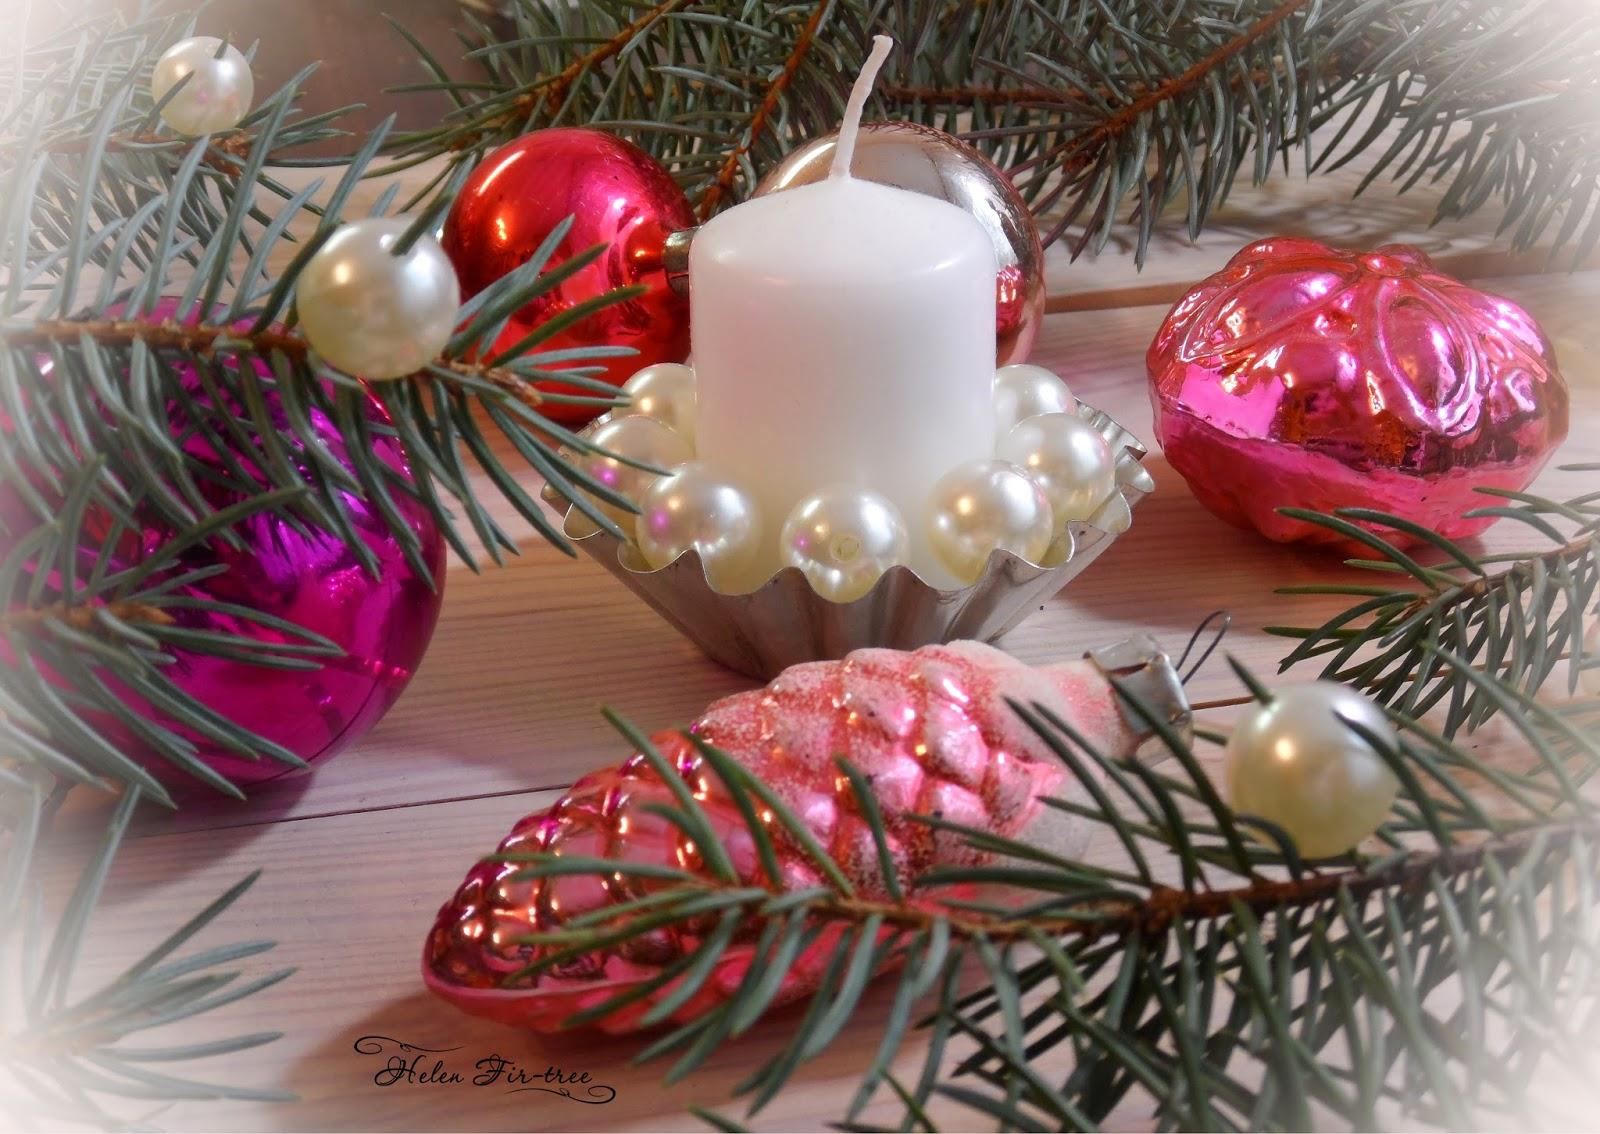 Helen Fir-tree винтажные ёлочные украшения Vintage Christmas decorations